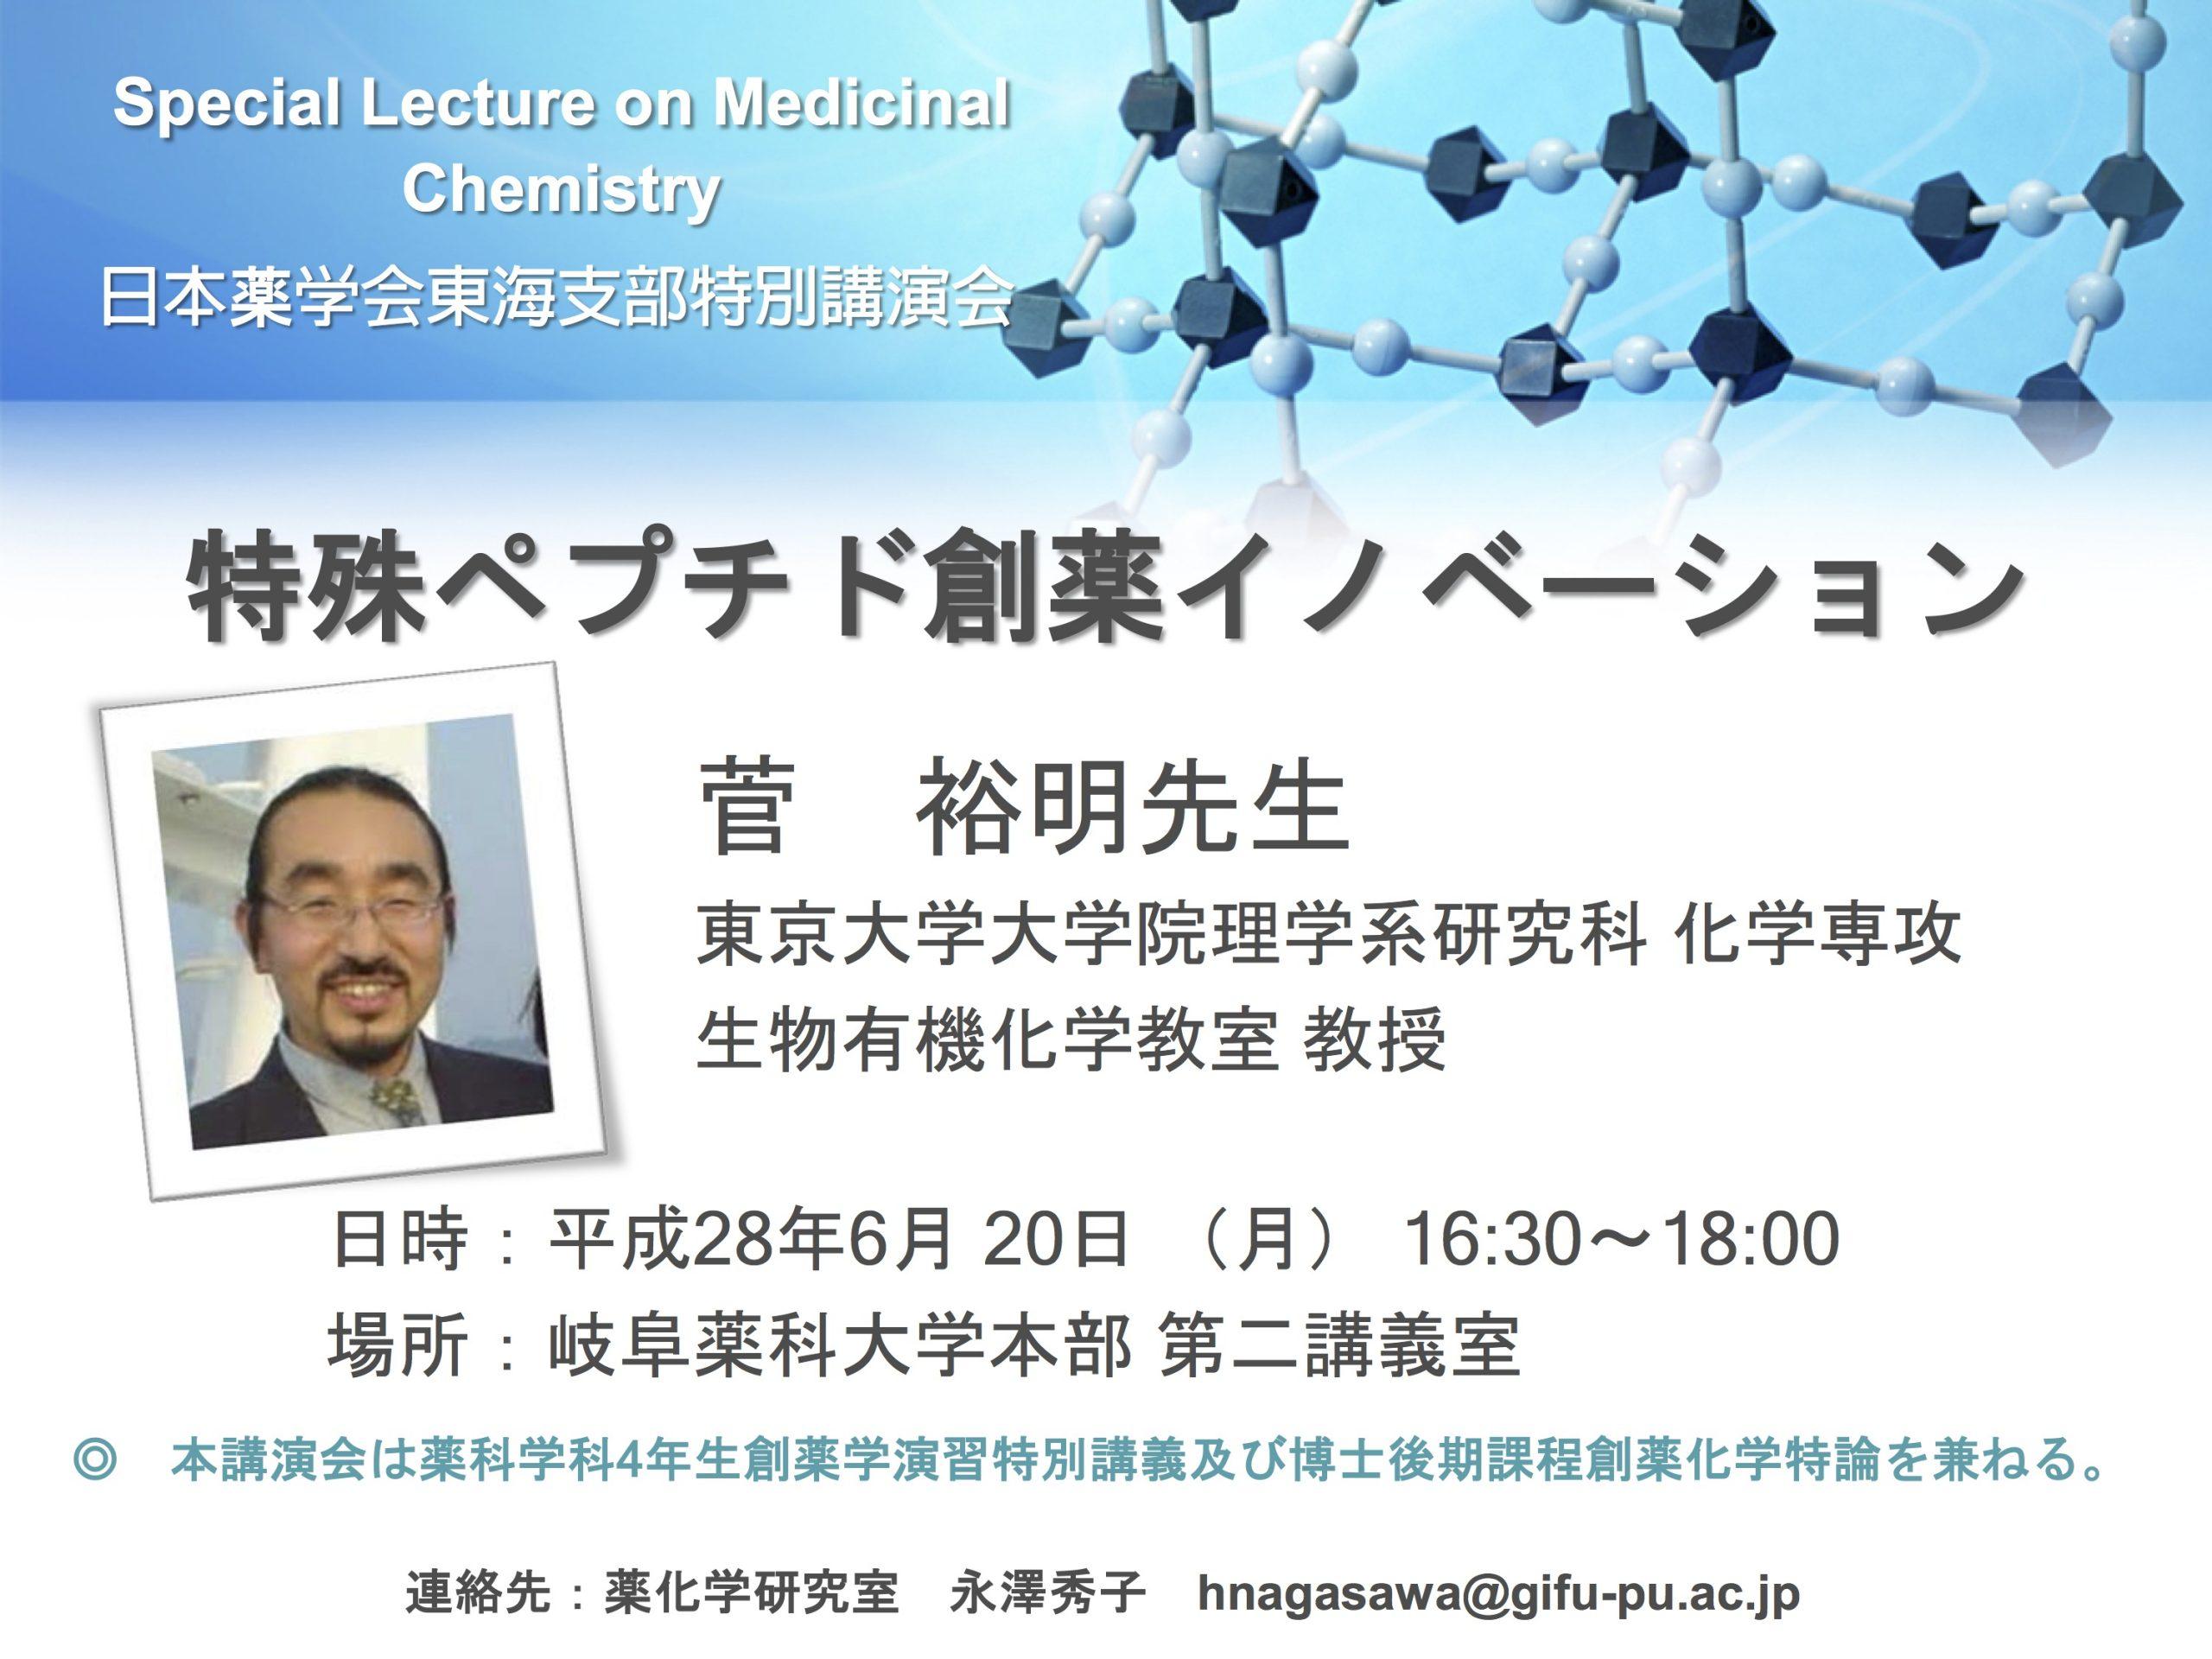 2016. June 20, 菅裕明先生(東京大学大学院理学研究科)による特別講演会が開催されます。奮ってご参加ください。